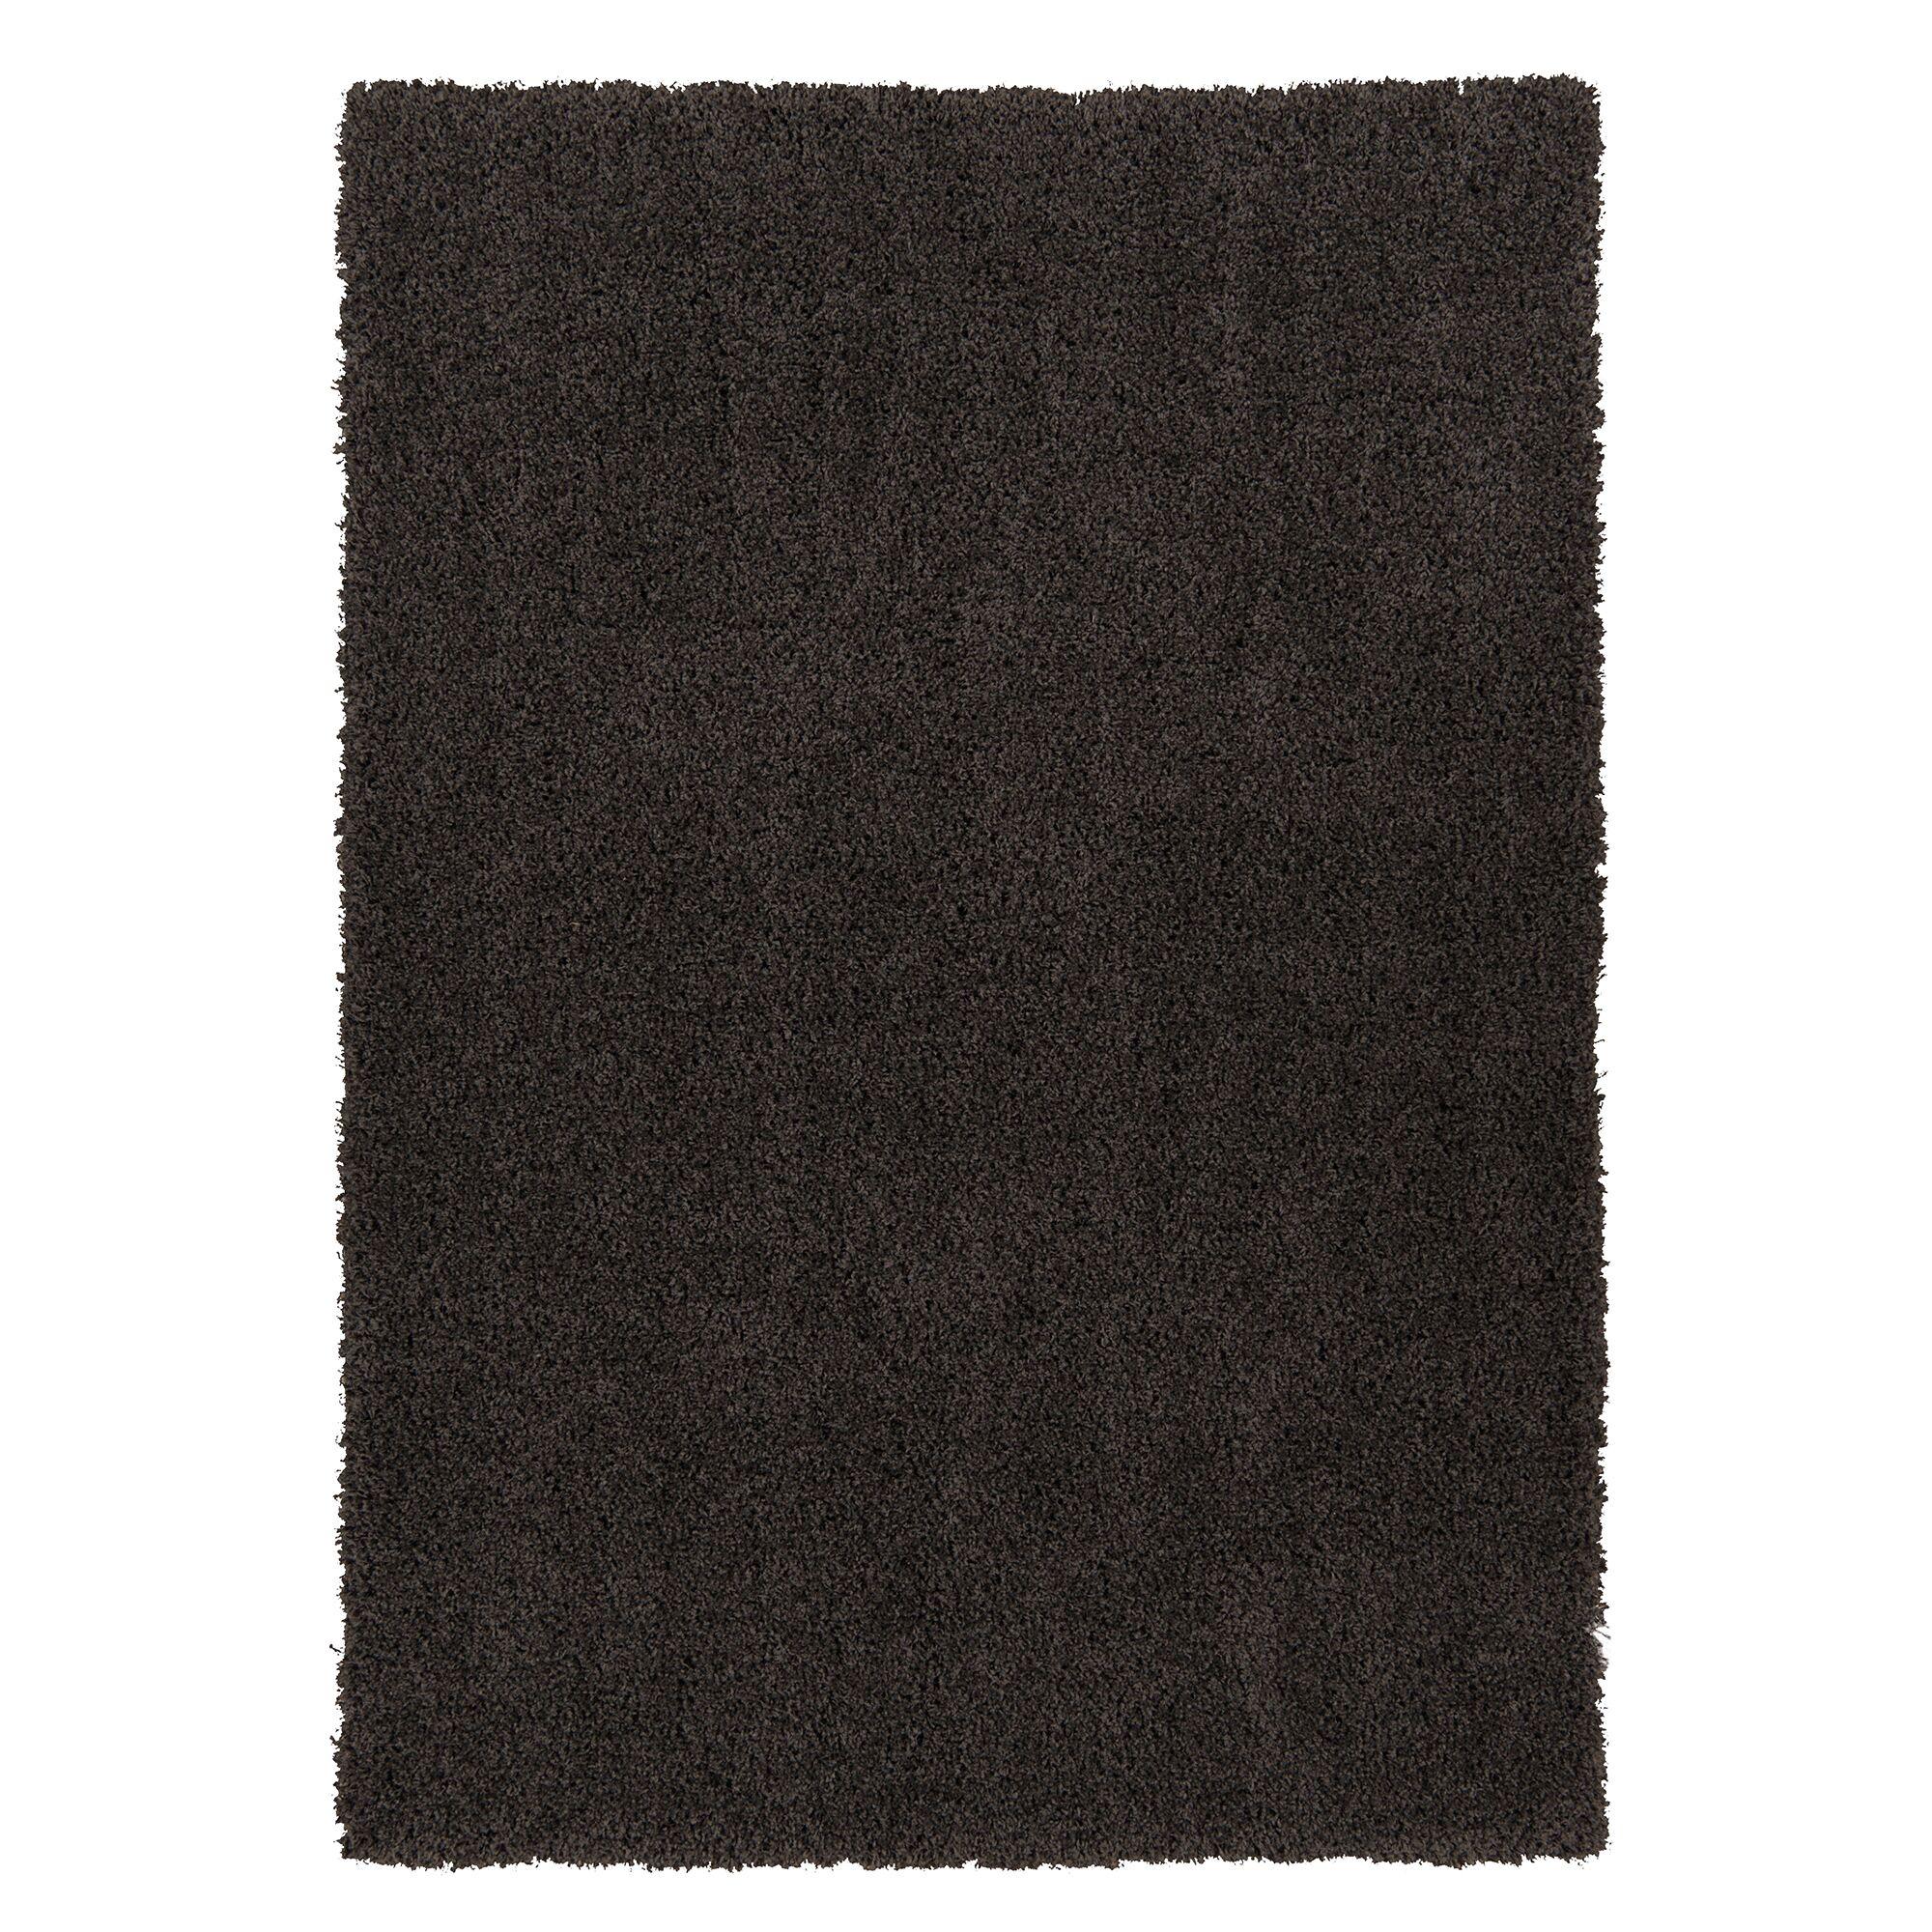 Cozy Shag Machine Woven Mat Color: Charcoal Grey